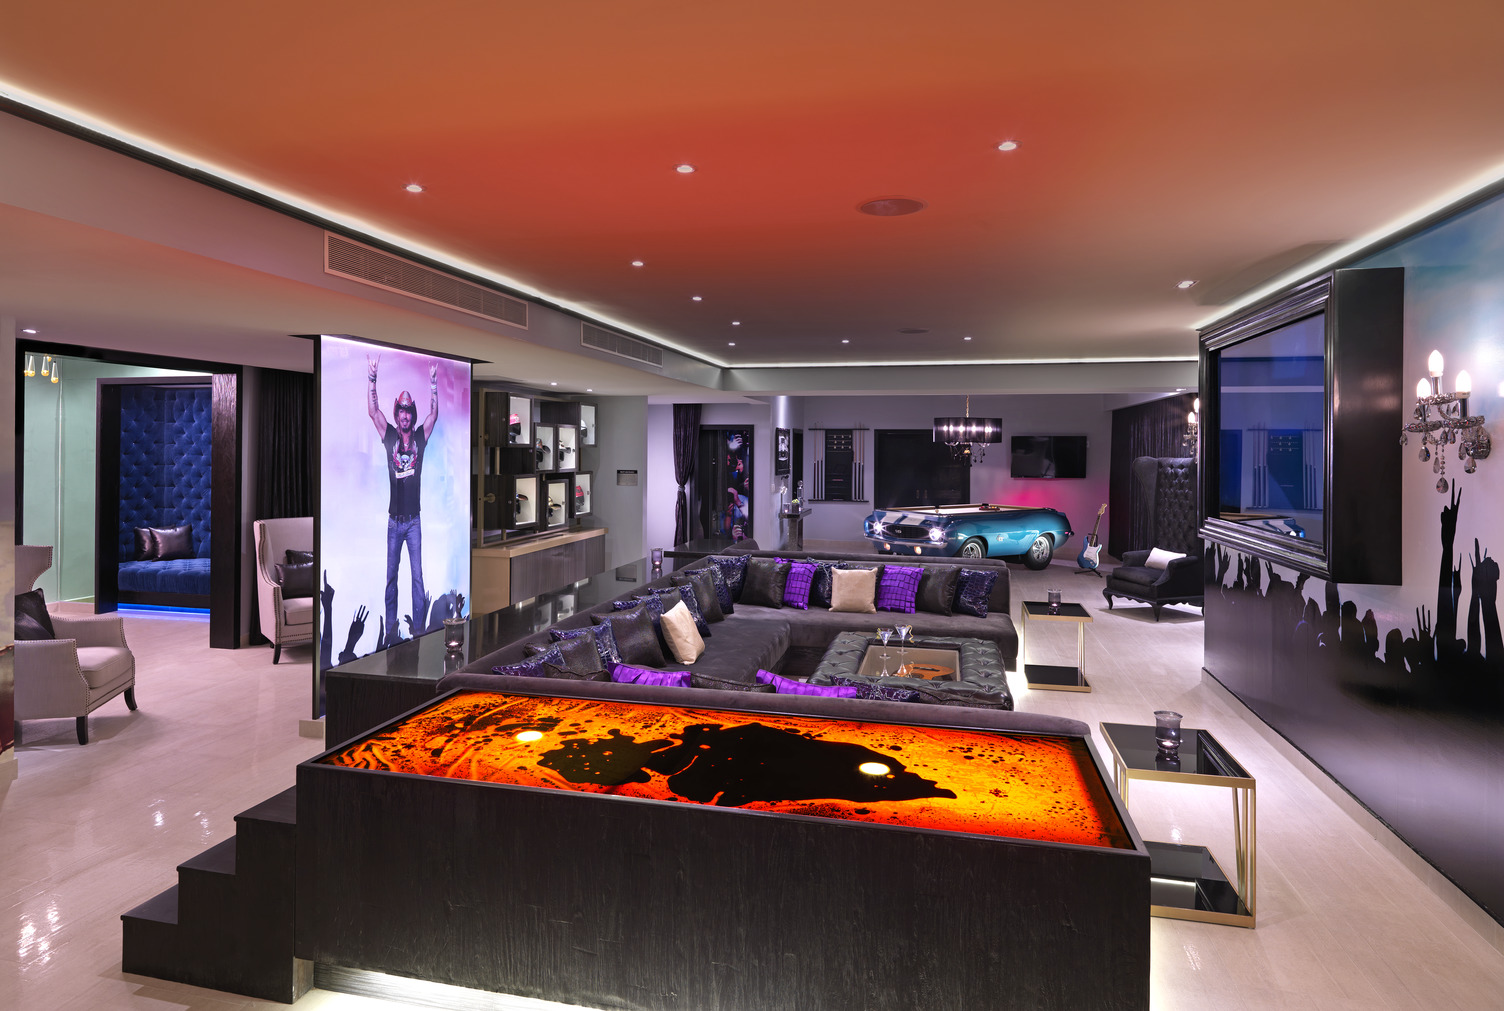 Travel Agency All-Inclusive Resort Heaven at Hard Rock Hotel Riviera Maya 26